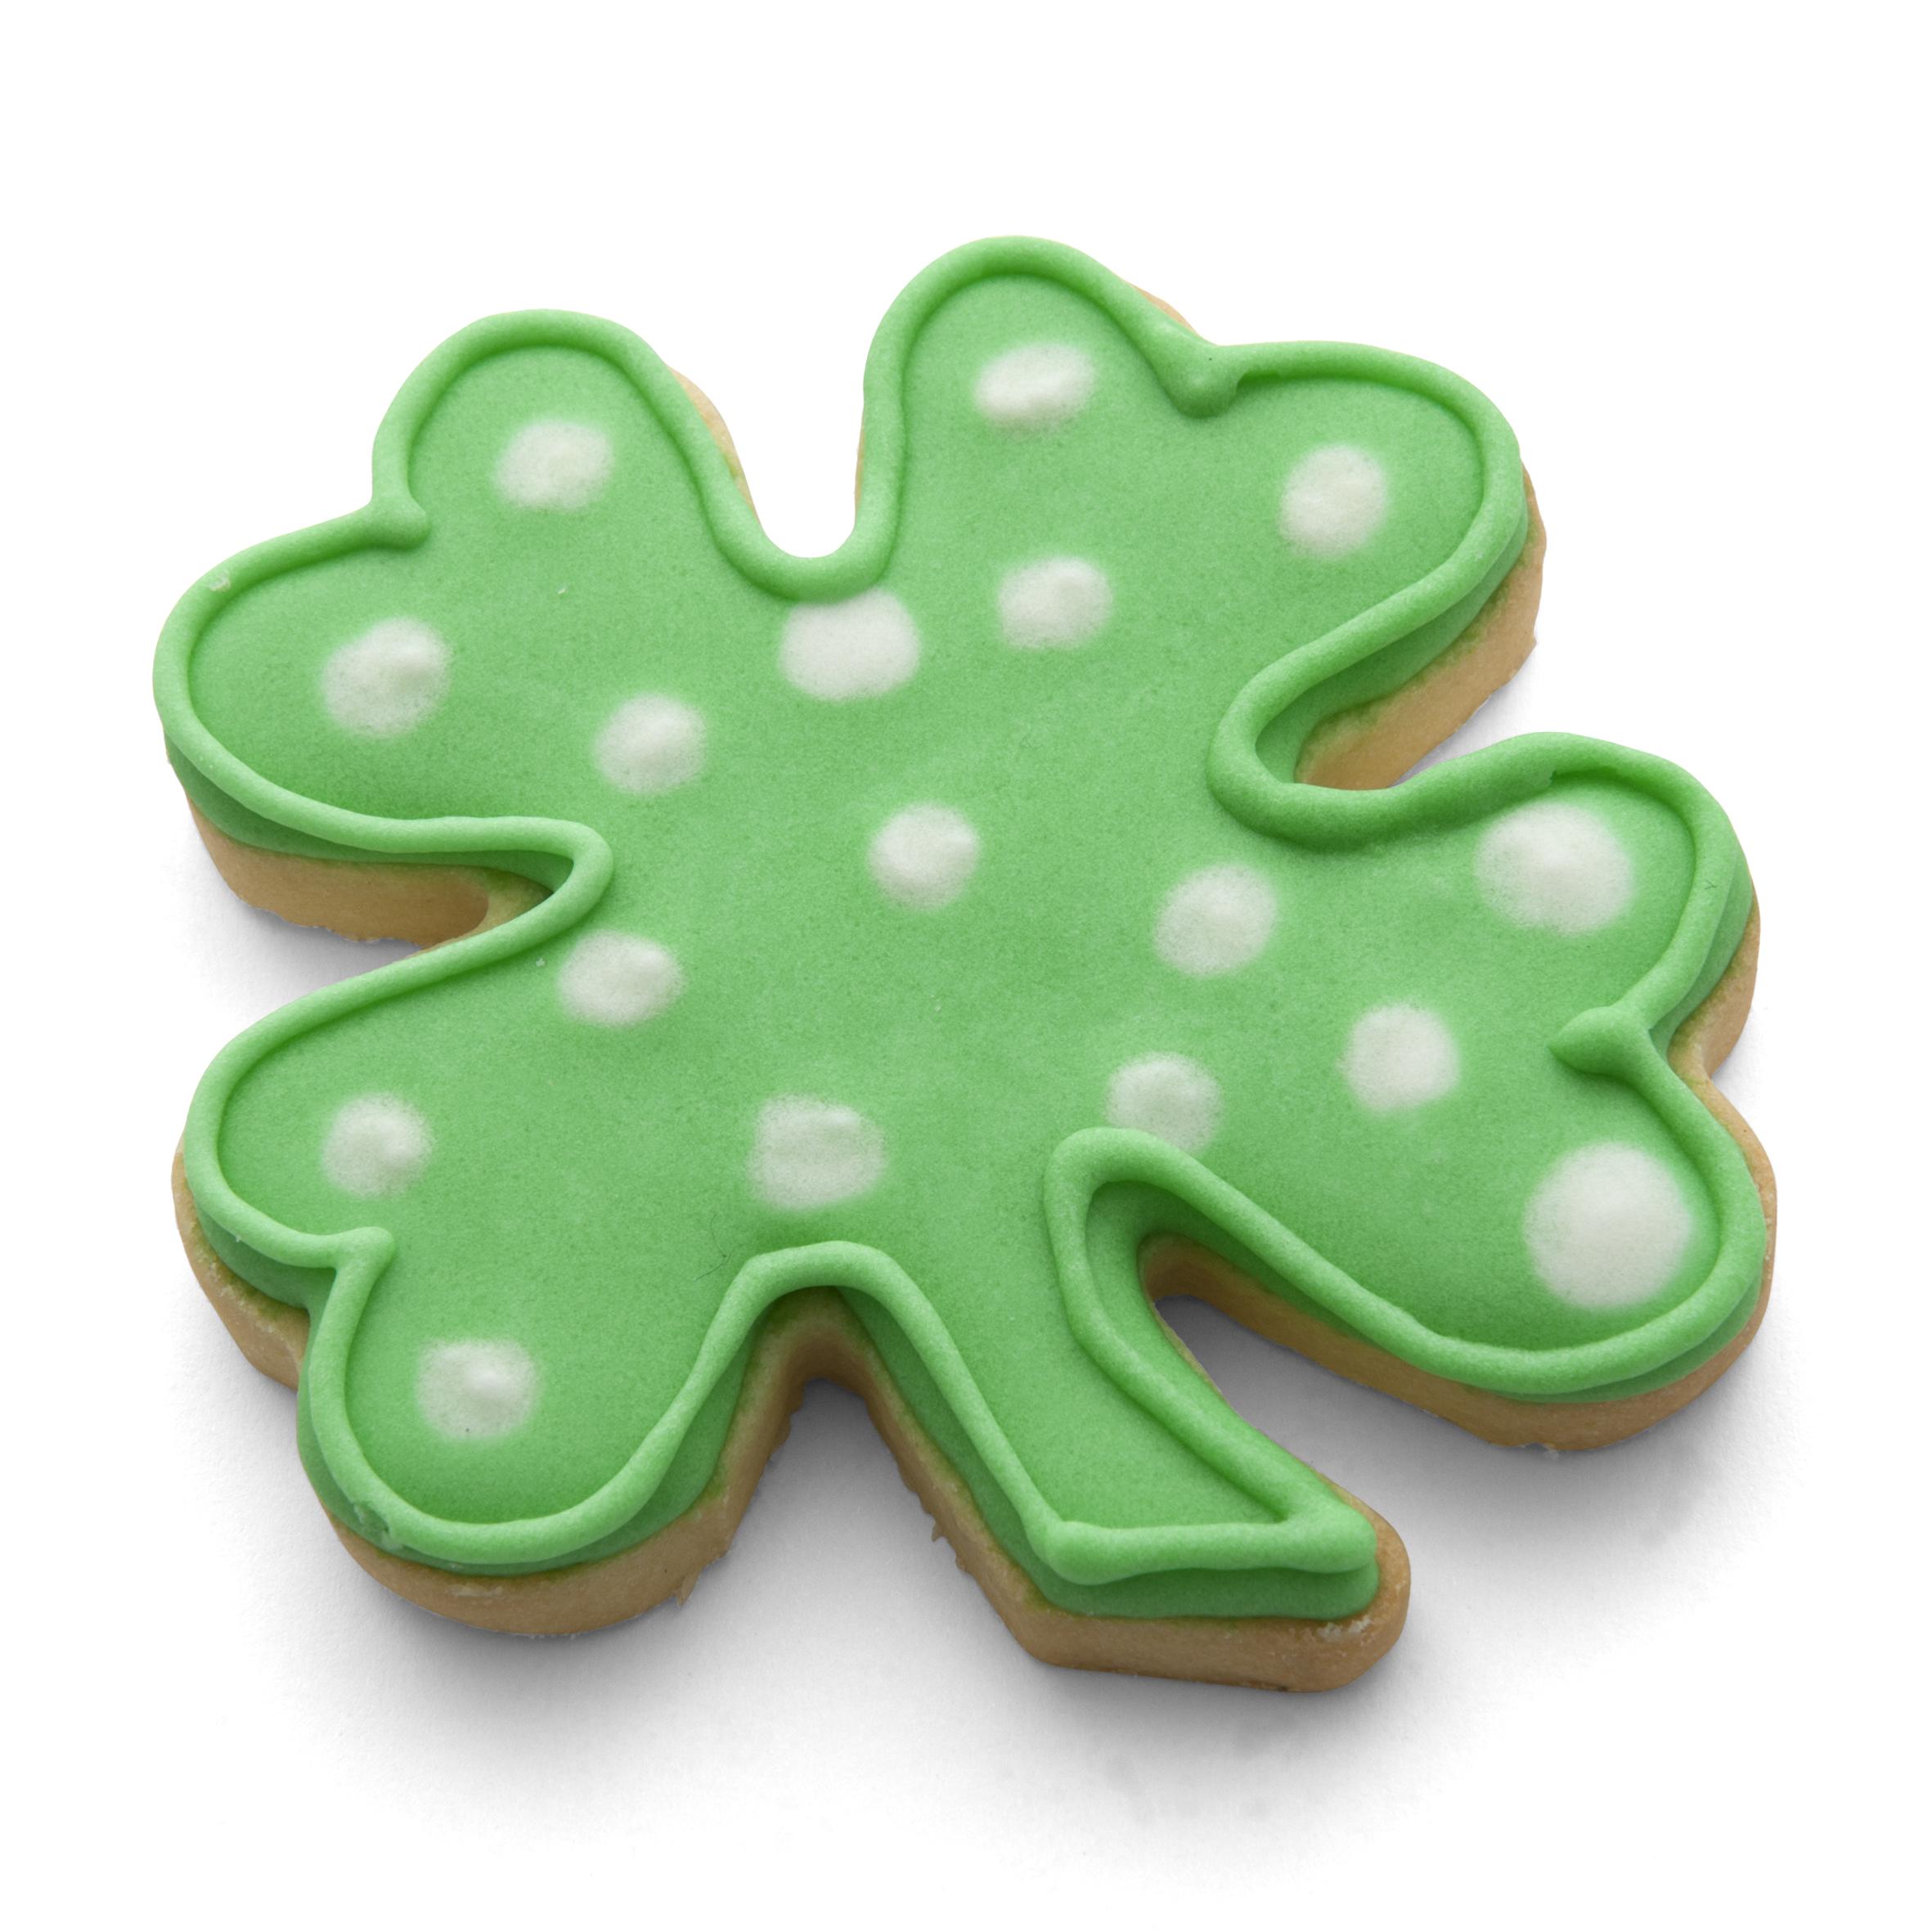 2362x2362 Clover Four Leaf Cookie Cutter Cuttercraft